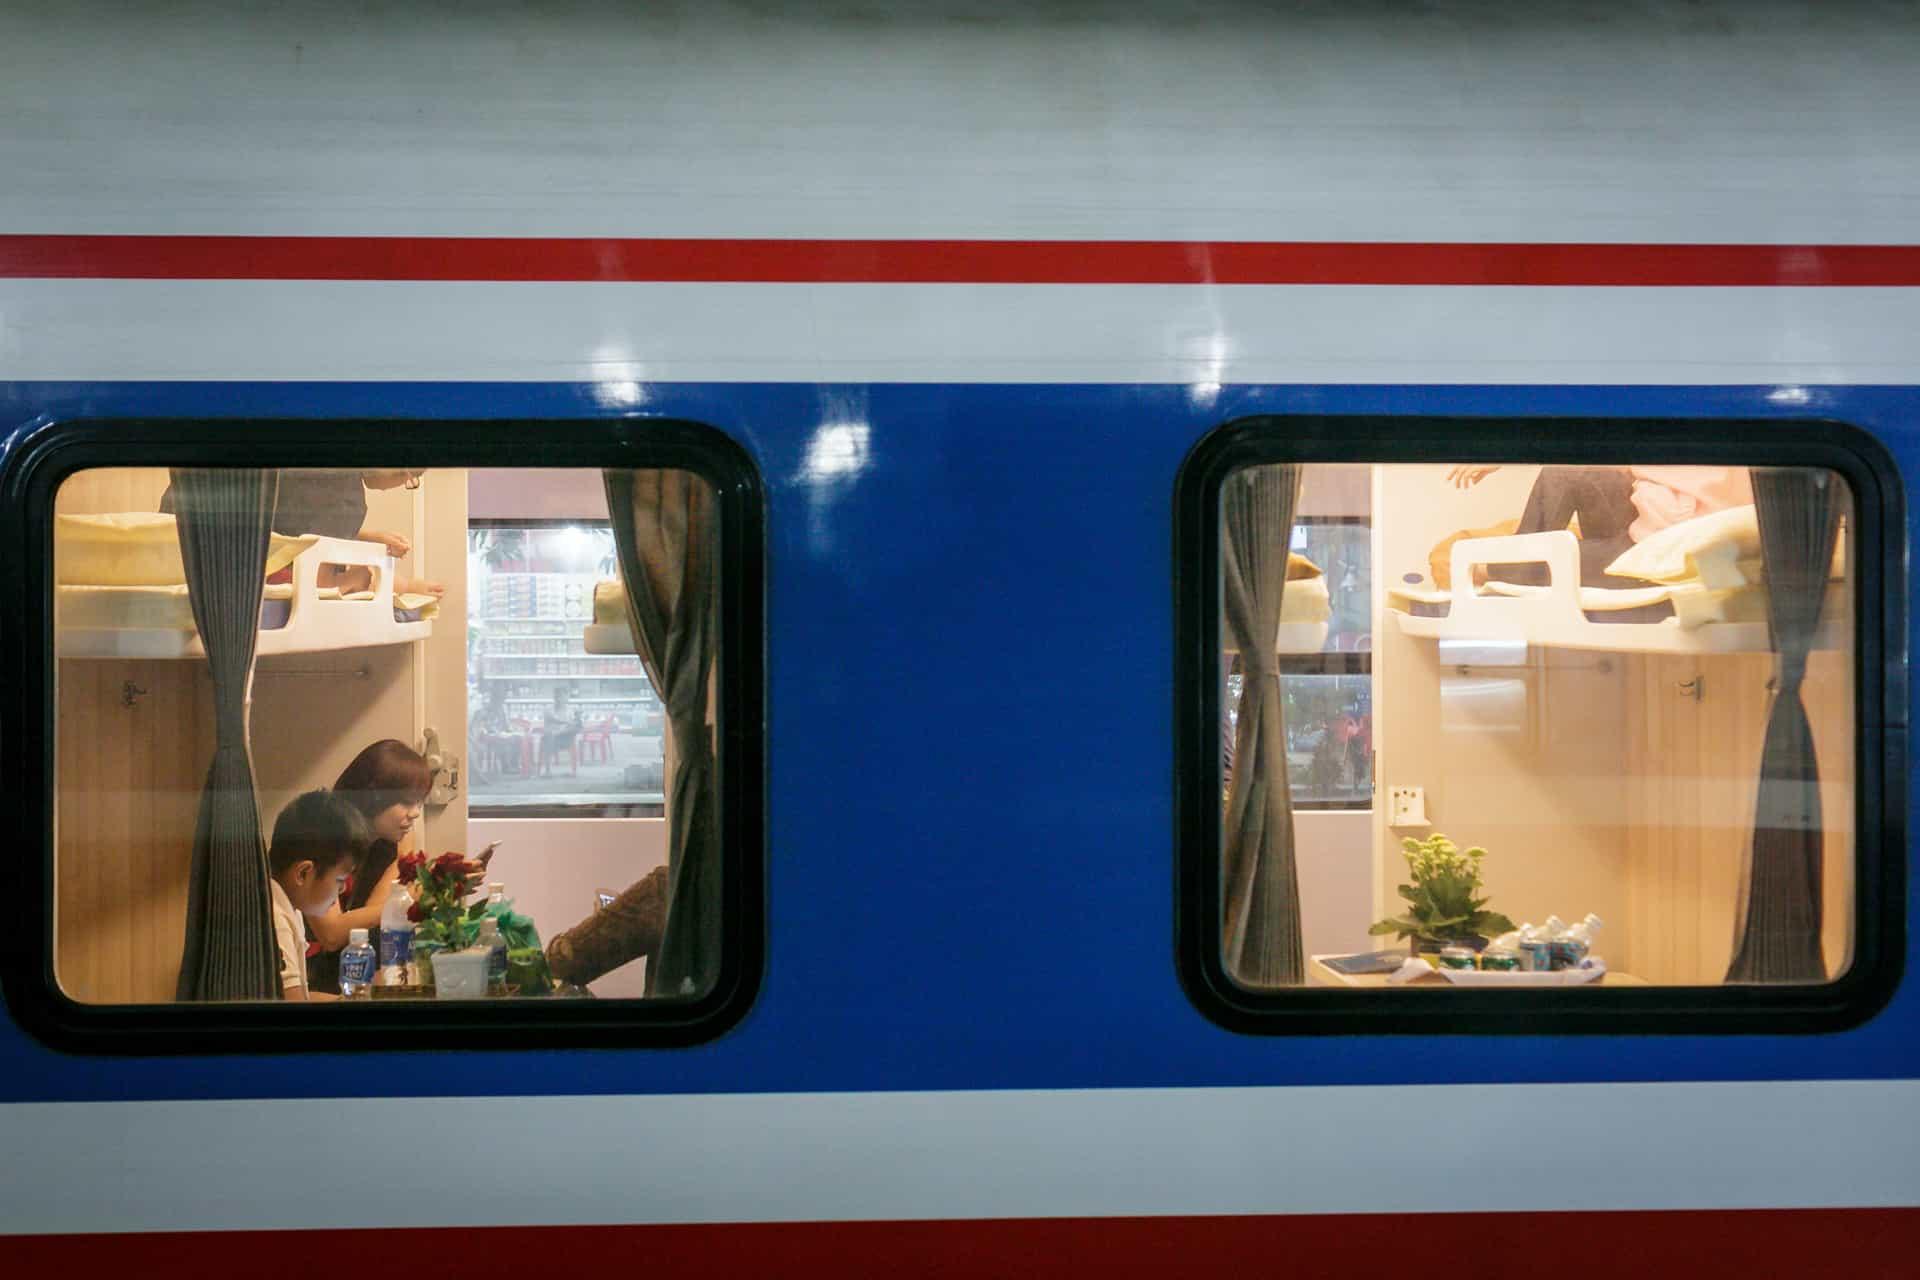 Punctuality on Vietnam trains